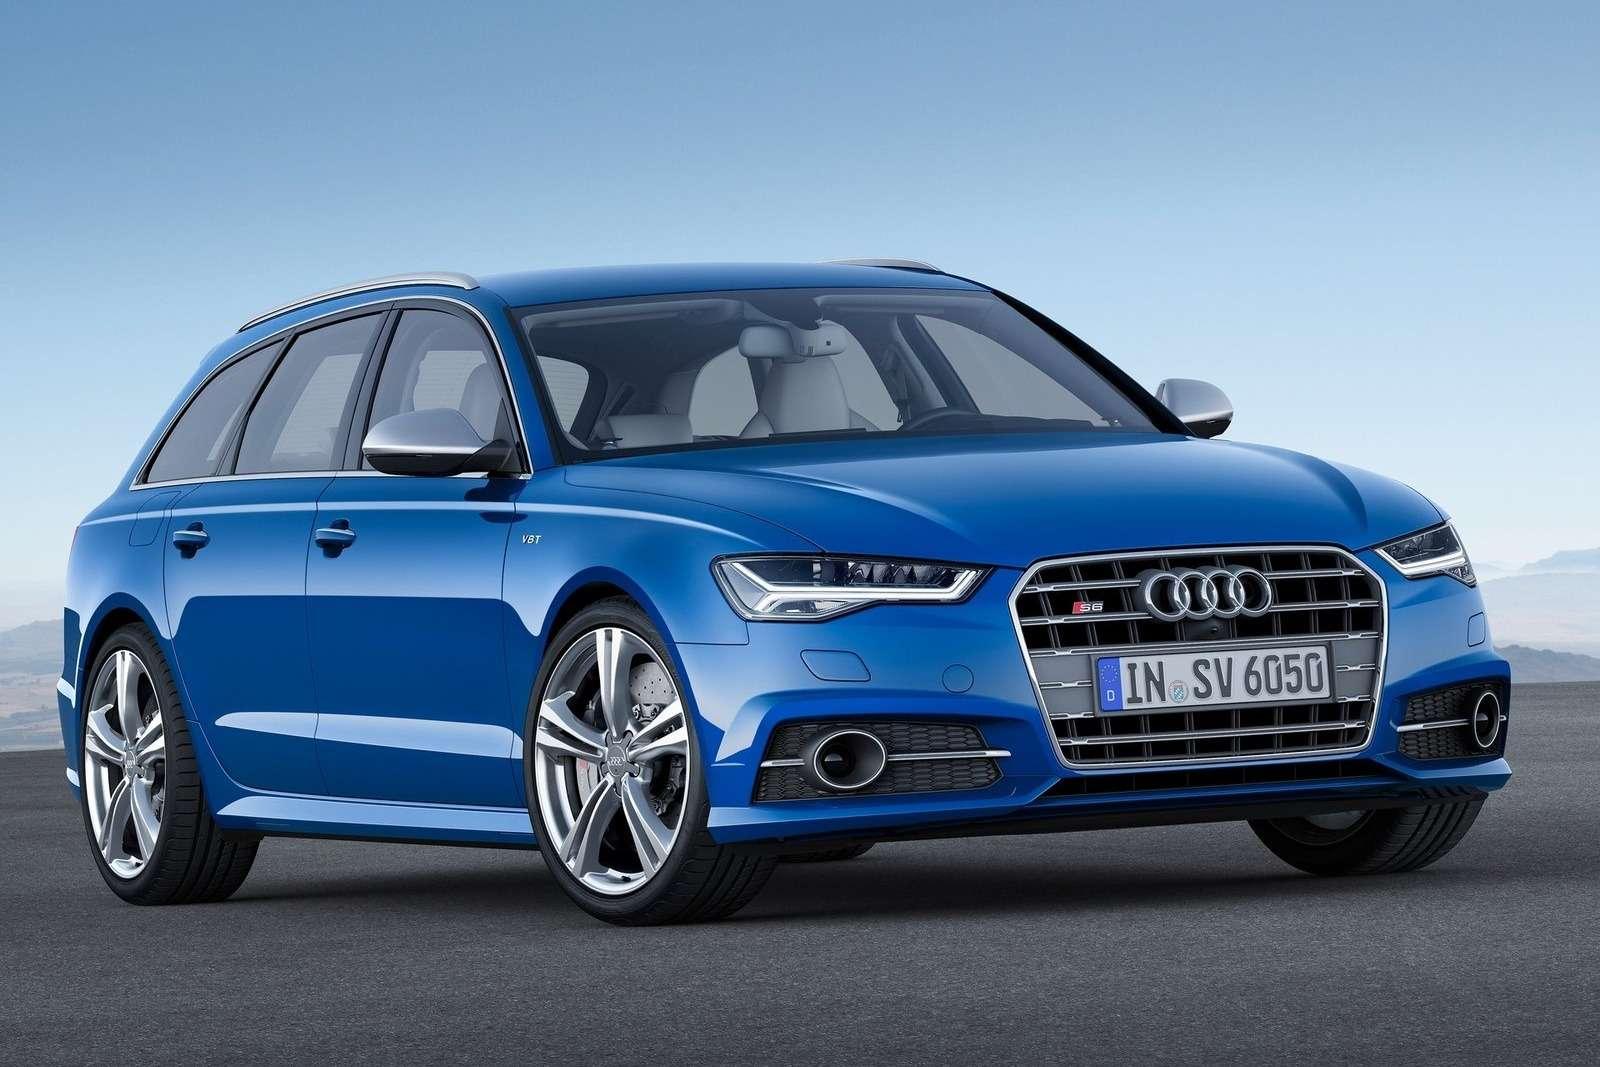 Audi-S6_Avant_2015_1600x1200_wallpaper_01